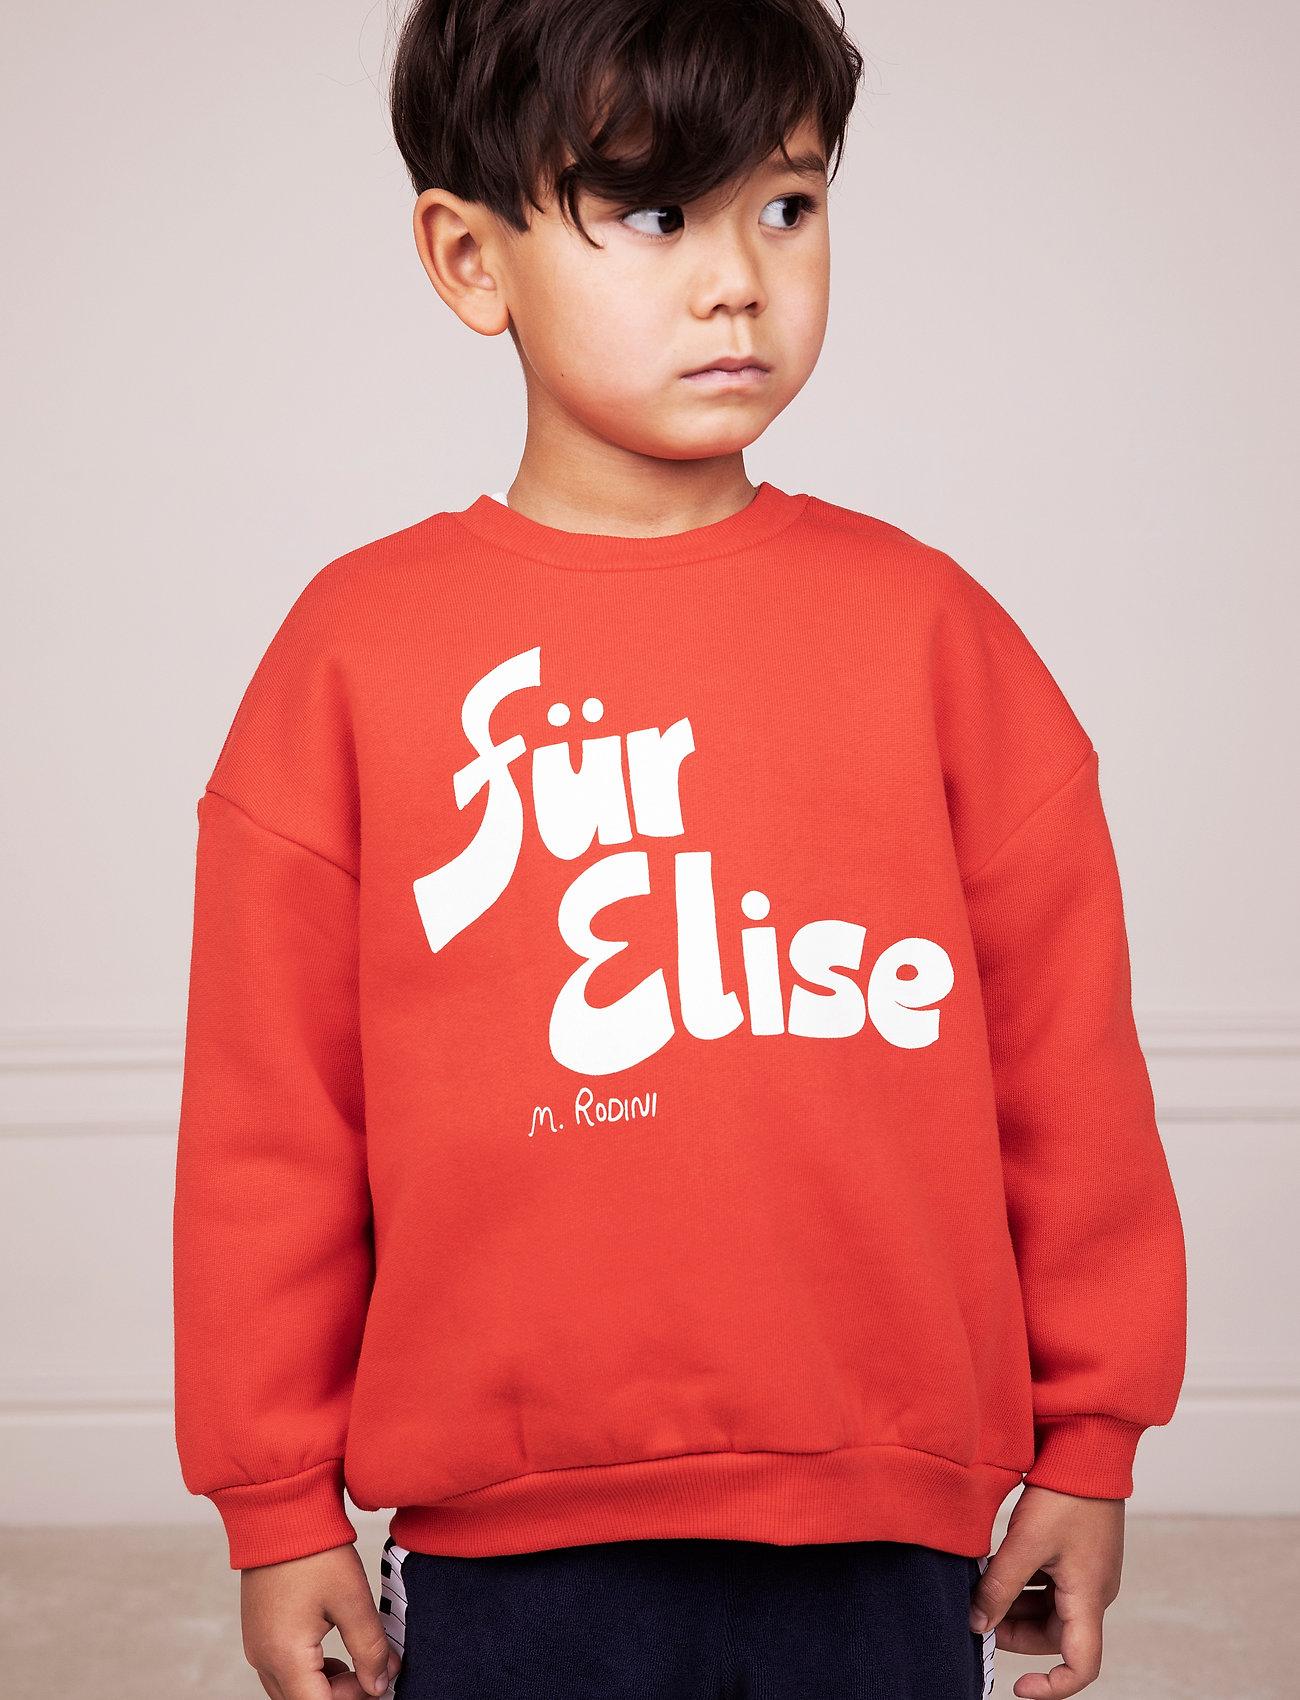 Mini Rodini - Für Elise sp sweatshirt - sweatshirts - red - 0